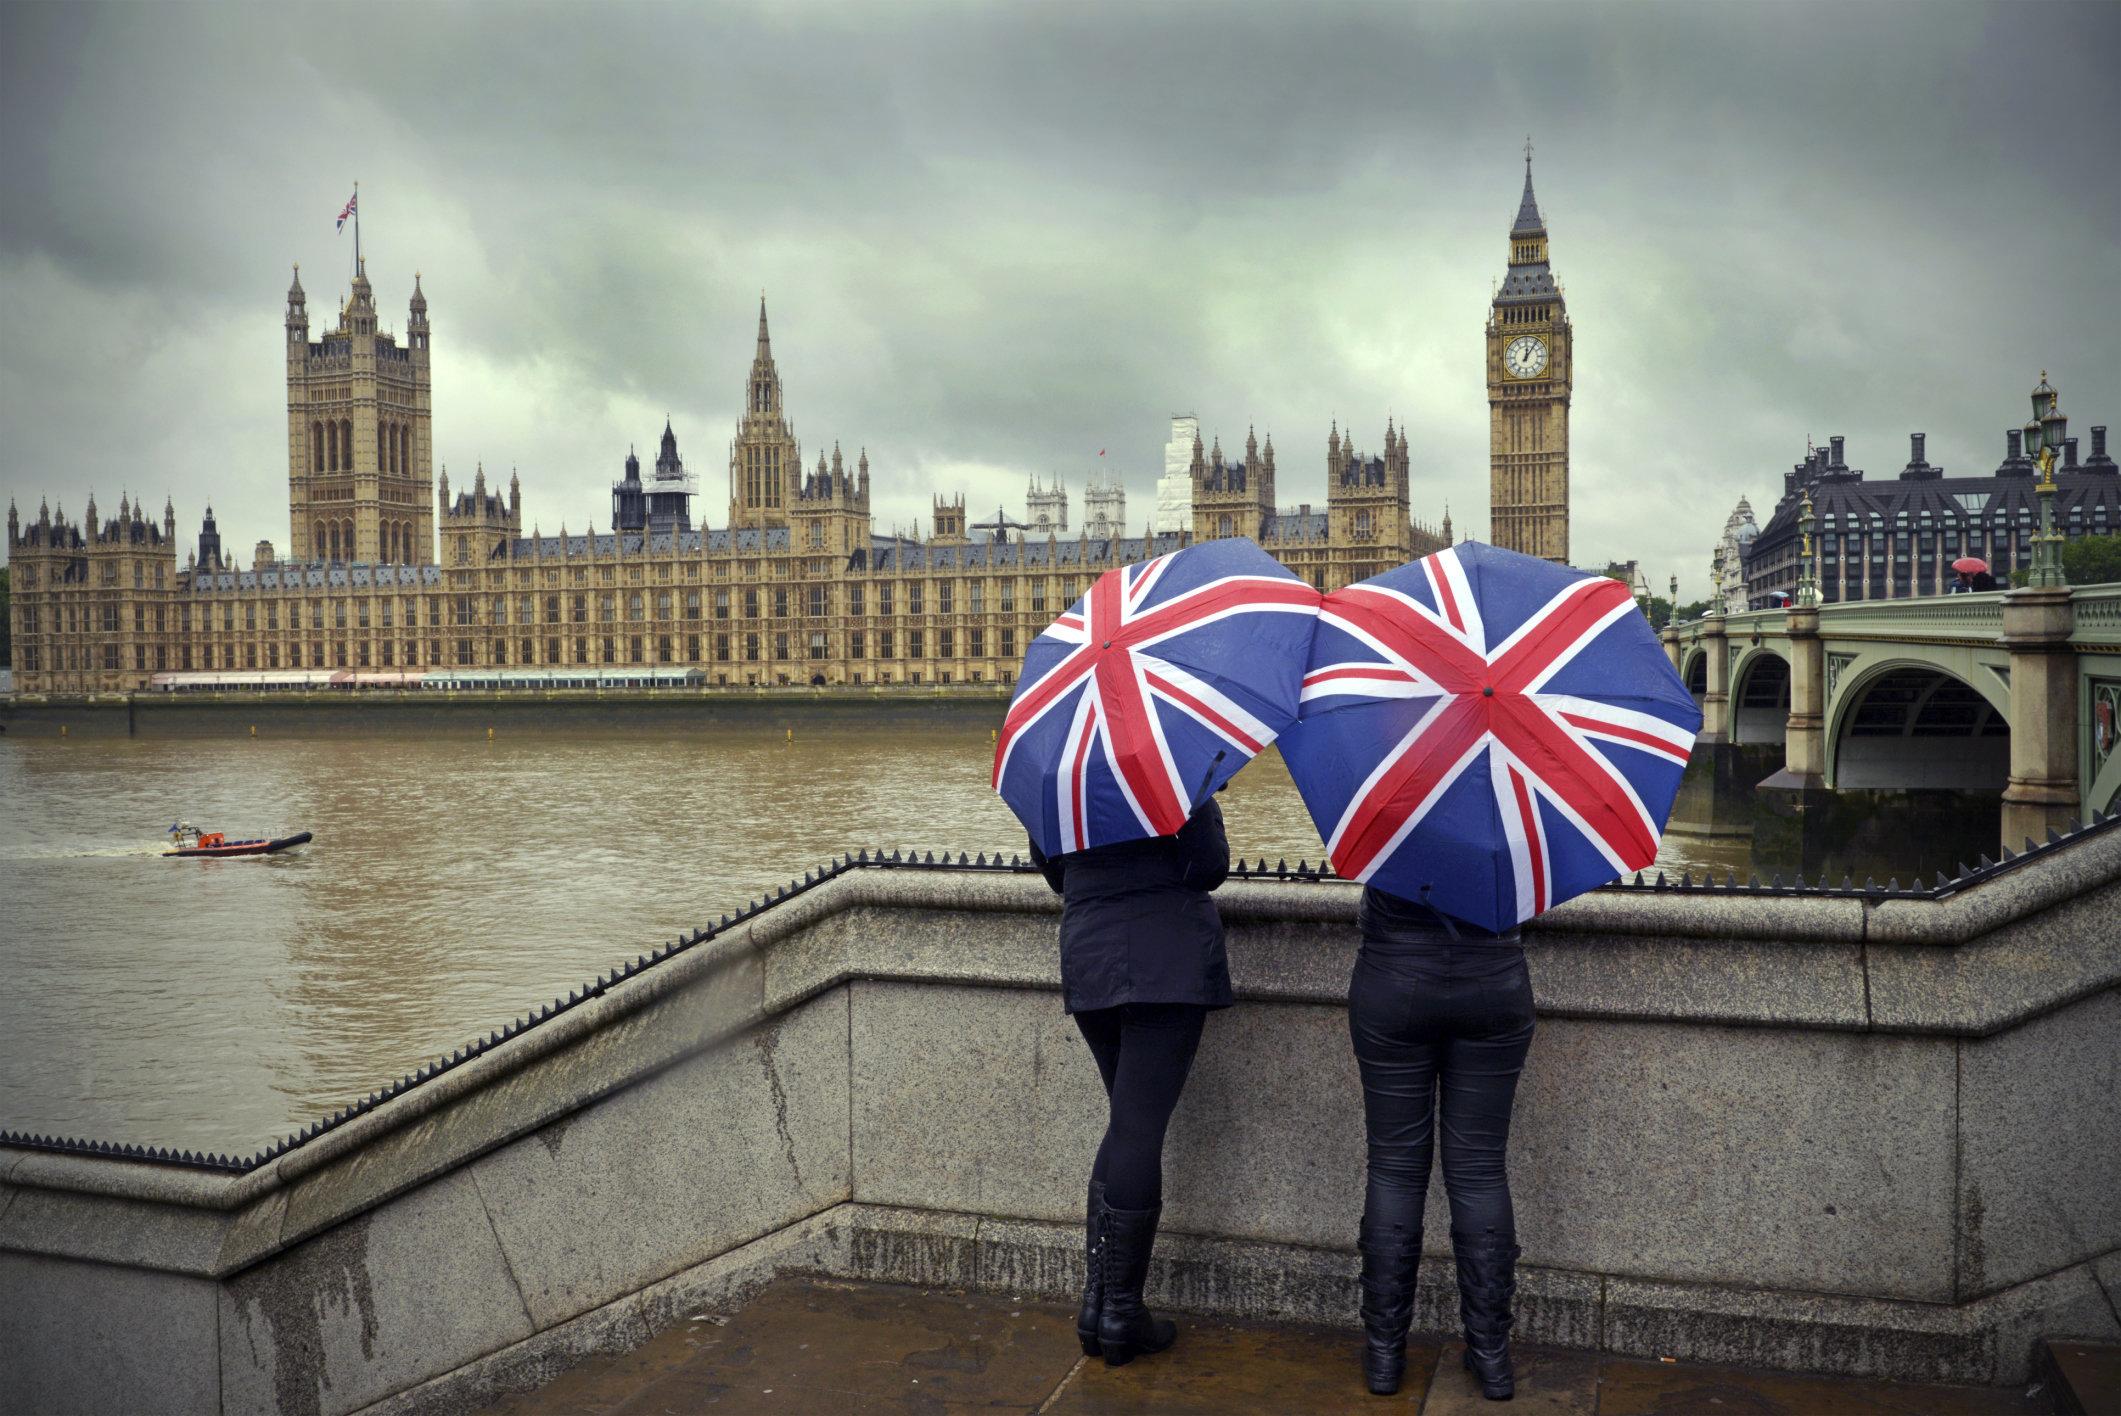 United Kingdom falls below Kazakhstan in top expat destination survey